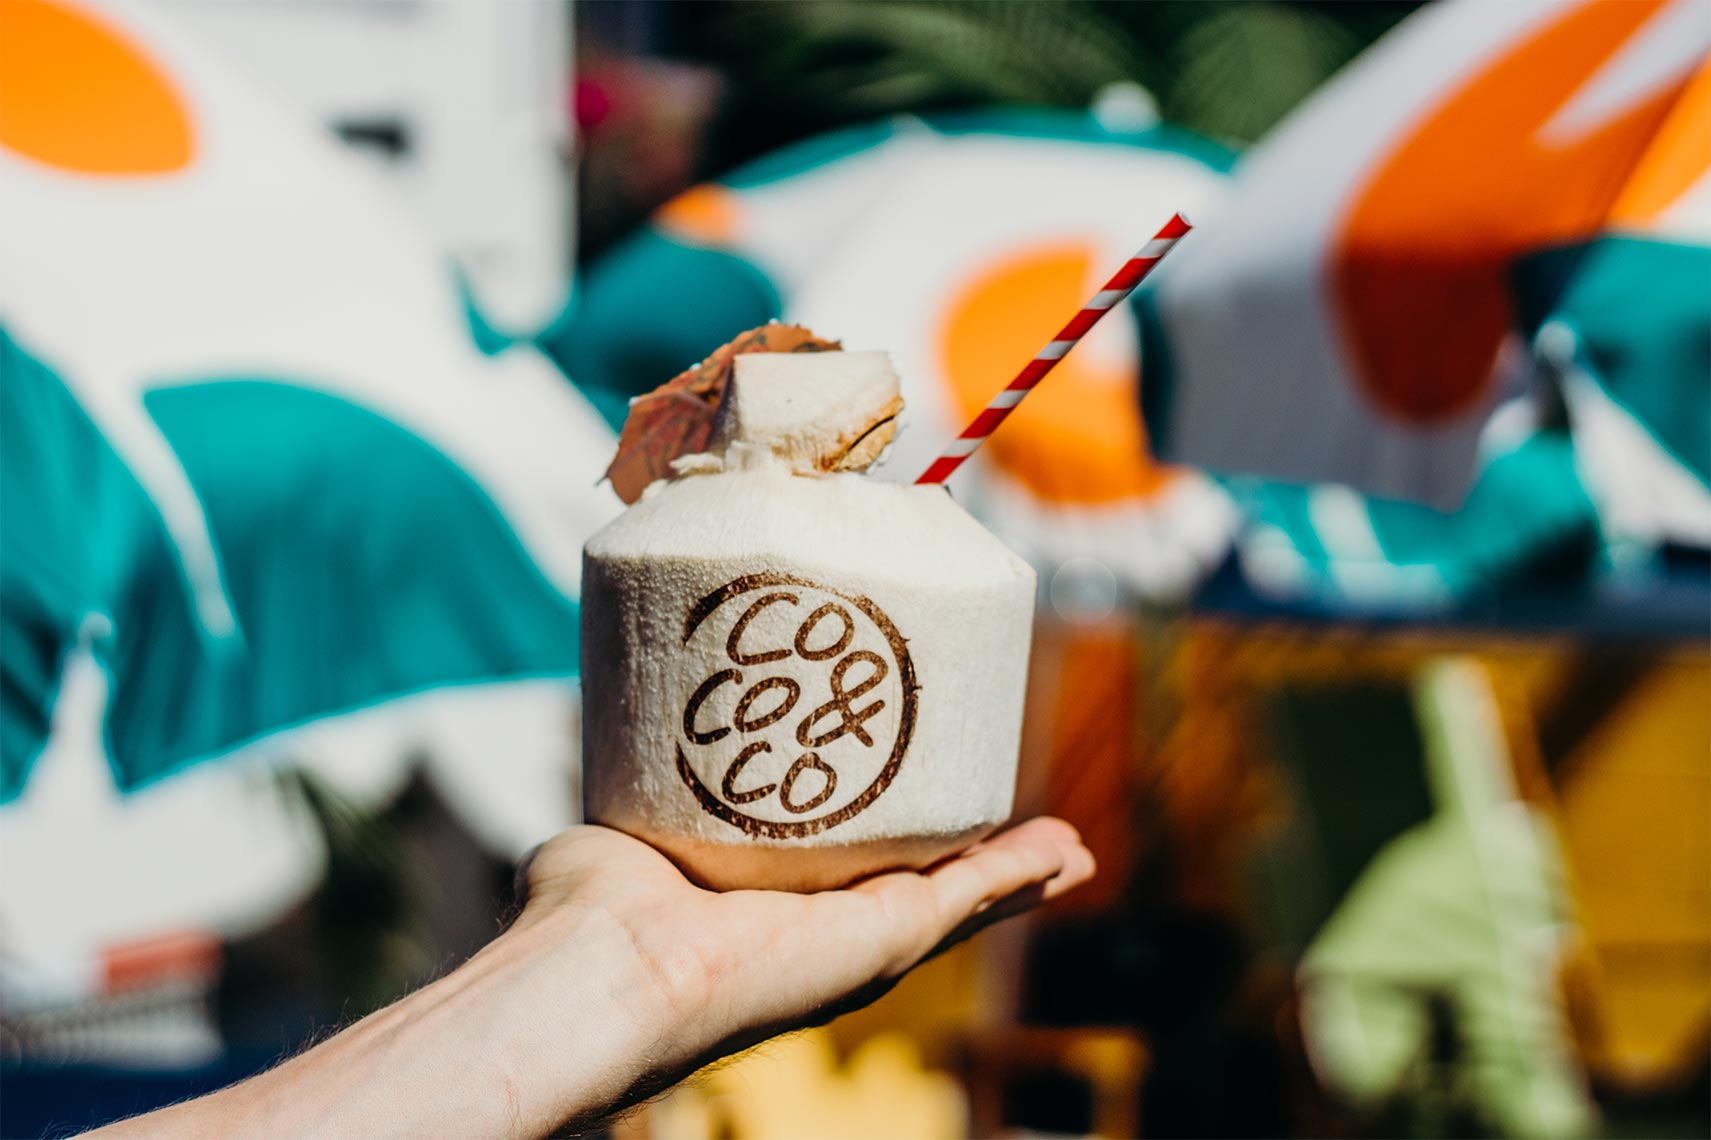 coco & co fresh coconuts creation by Meraki Narrative: A Branding, Design, and Creative Agency